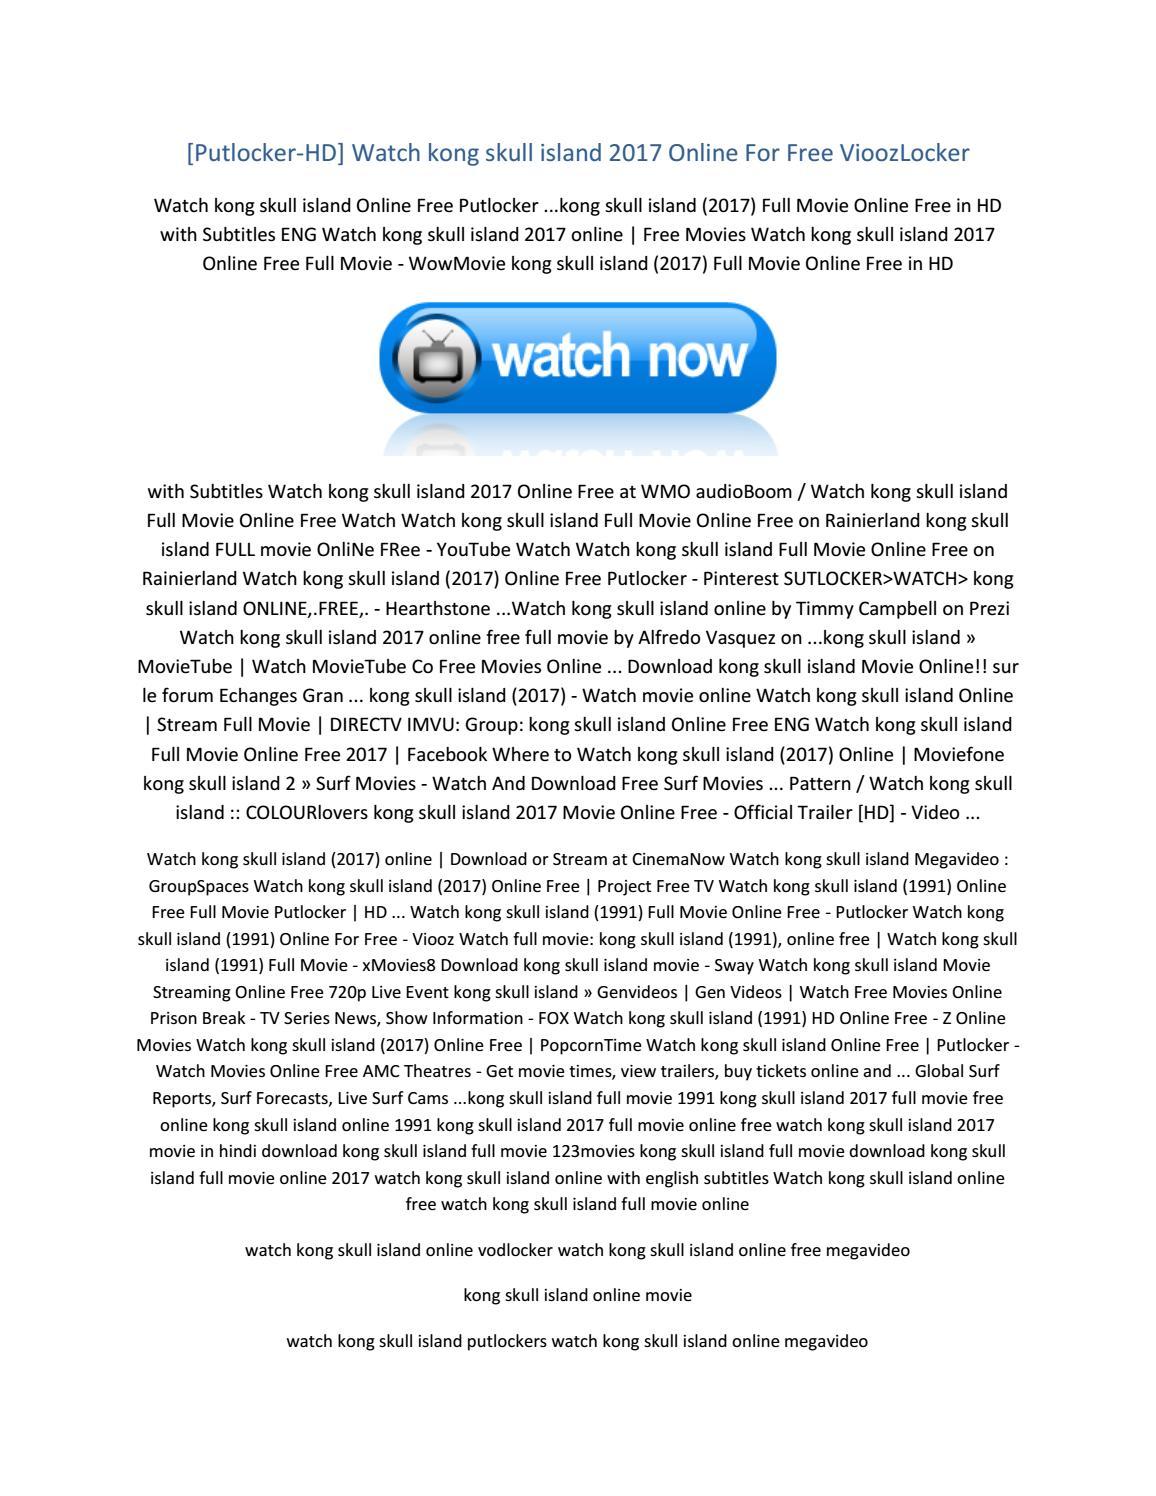 Https Www Linkedin Com Pulse Nstant Fate Furious 2017 Online Movie Ultra4k Rob Willson By Arrenabina Issuu